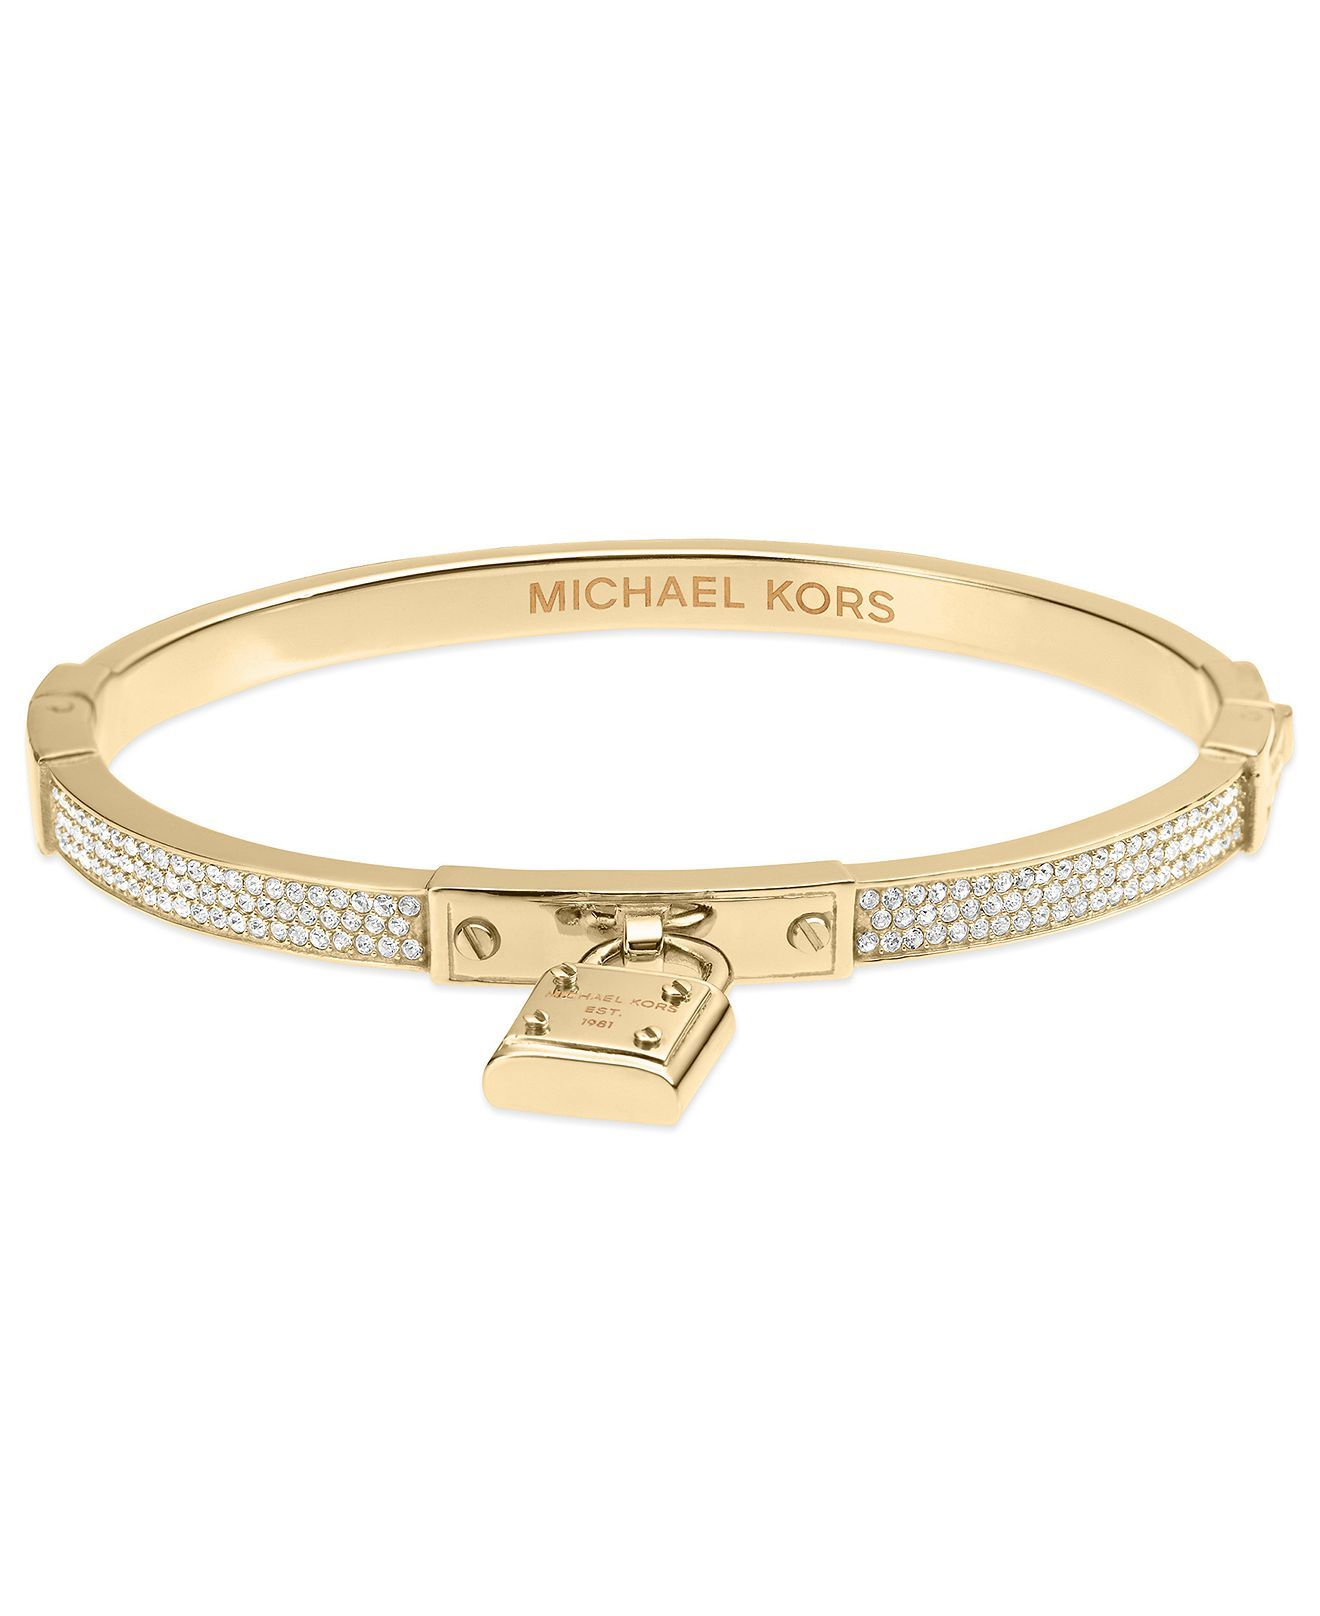 Pandora bracelet dillards - Michael Kors Bracelet Gold Tone Padlock Charm Bracelet Fashion Jewelry Jewelry